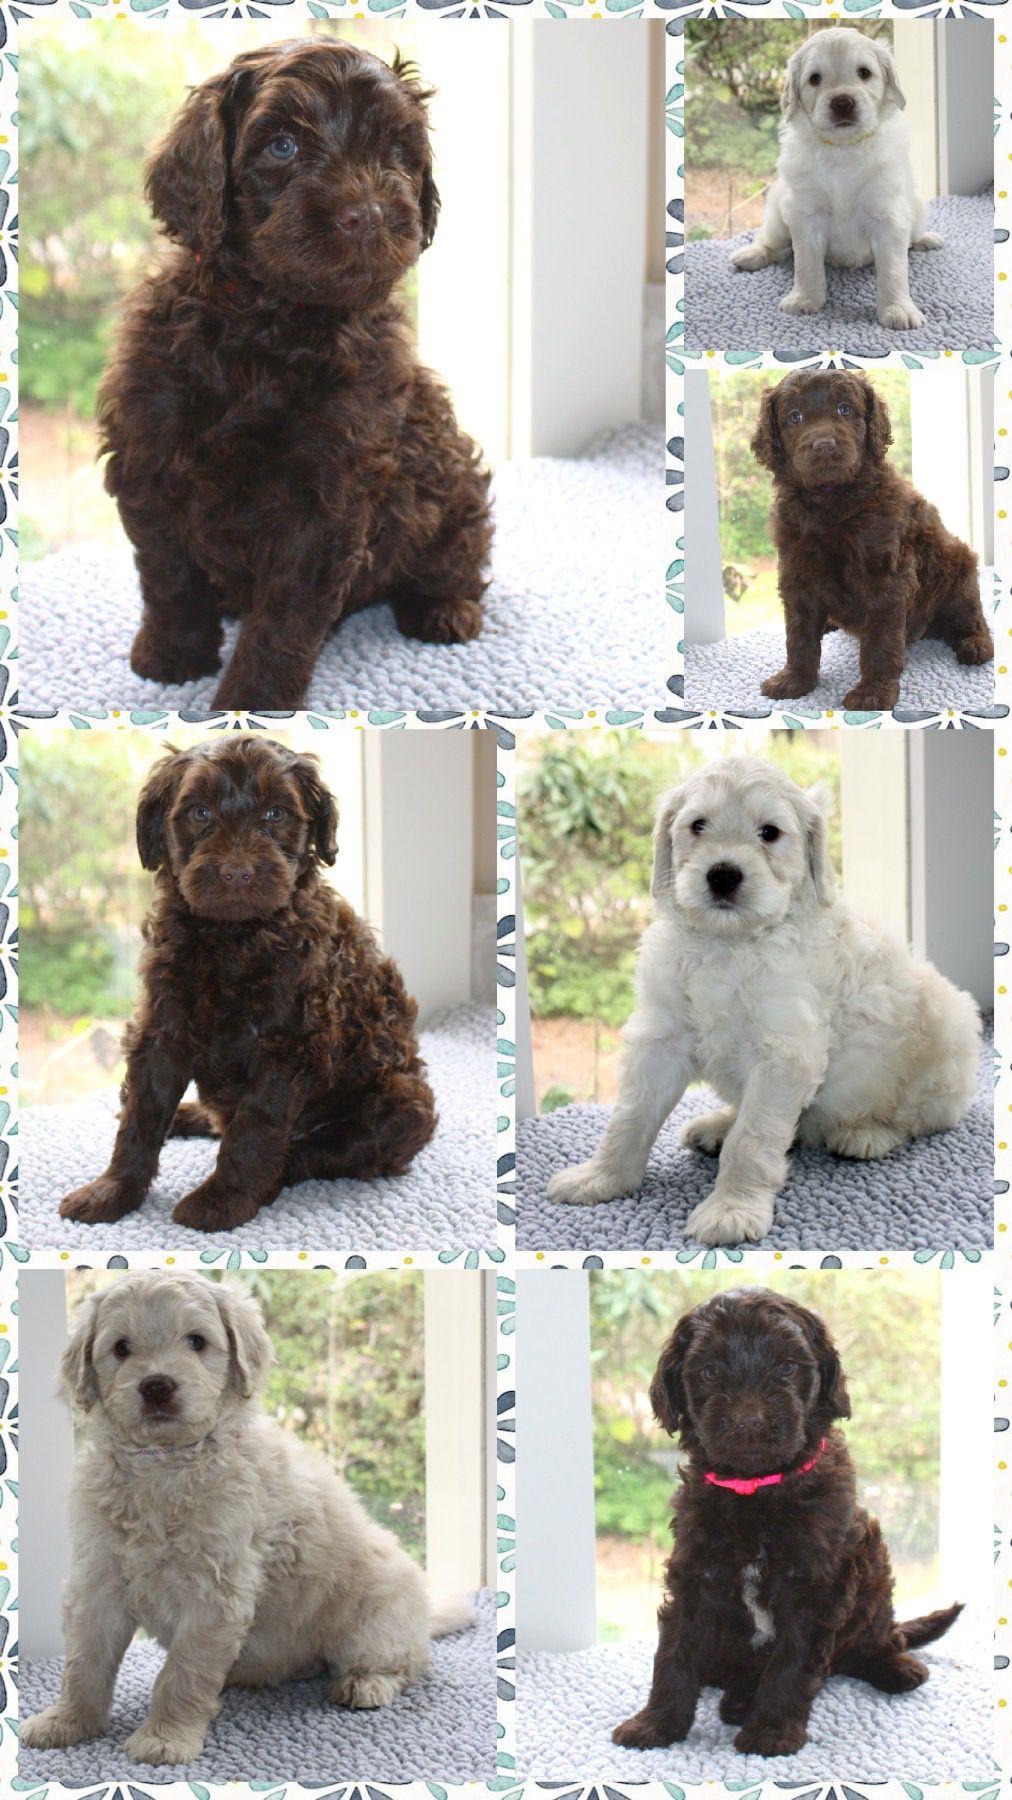 Australian Labradoodle Puppies In 2020 Australian Labradoodle Puppies Labradoodle Puppy Australian Labradoodle